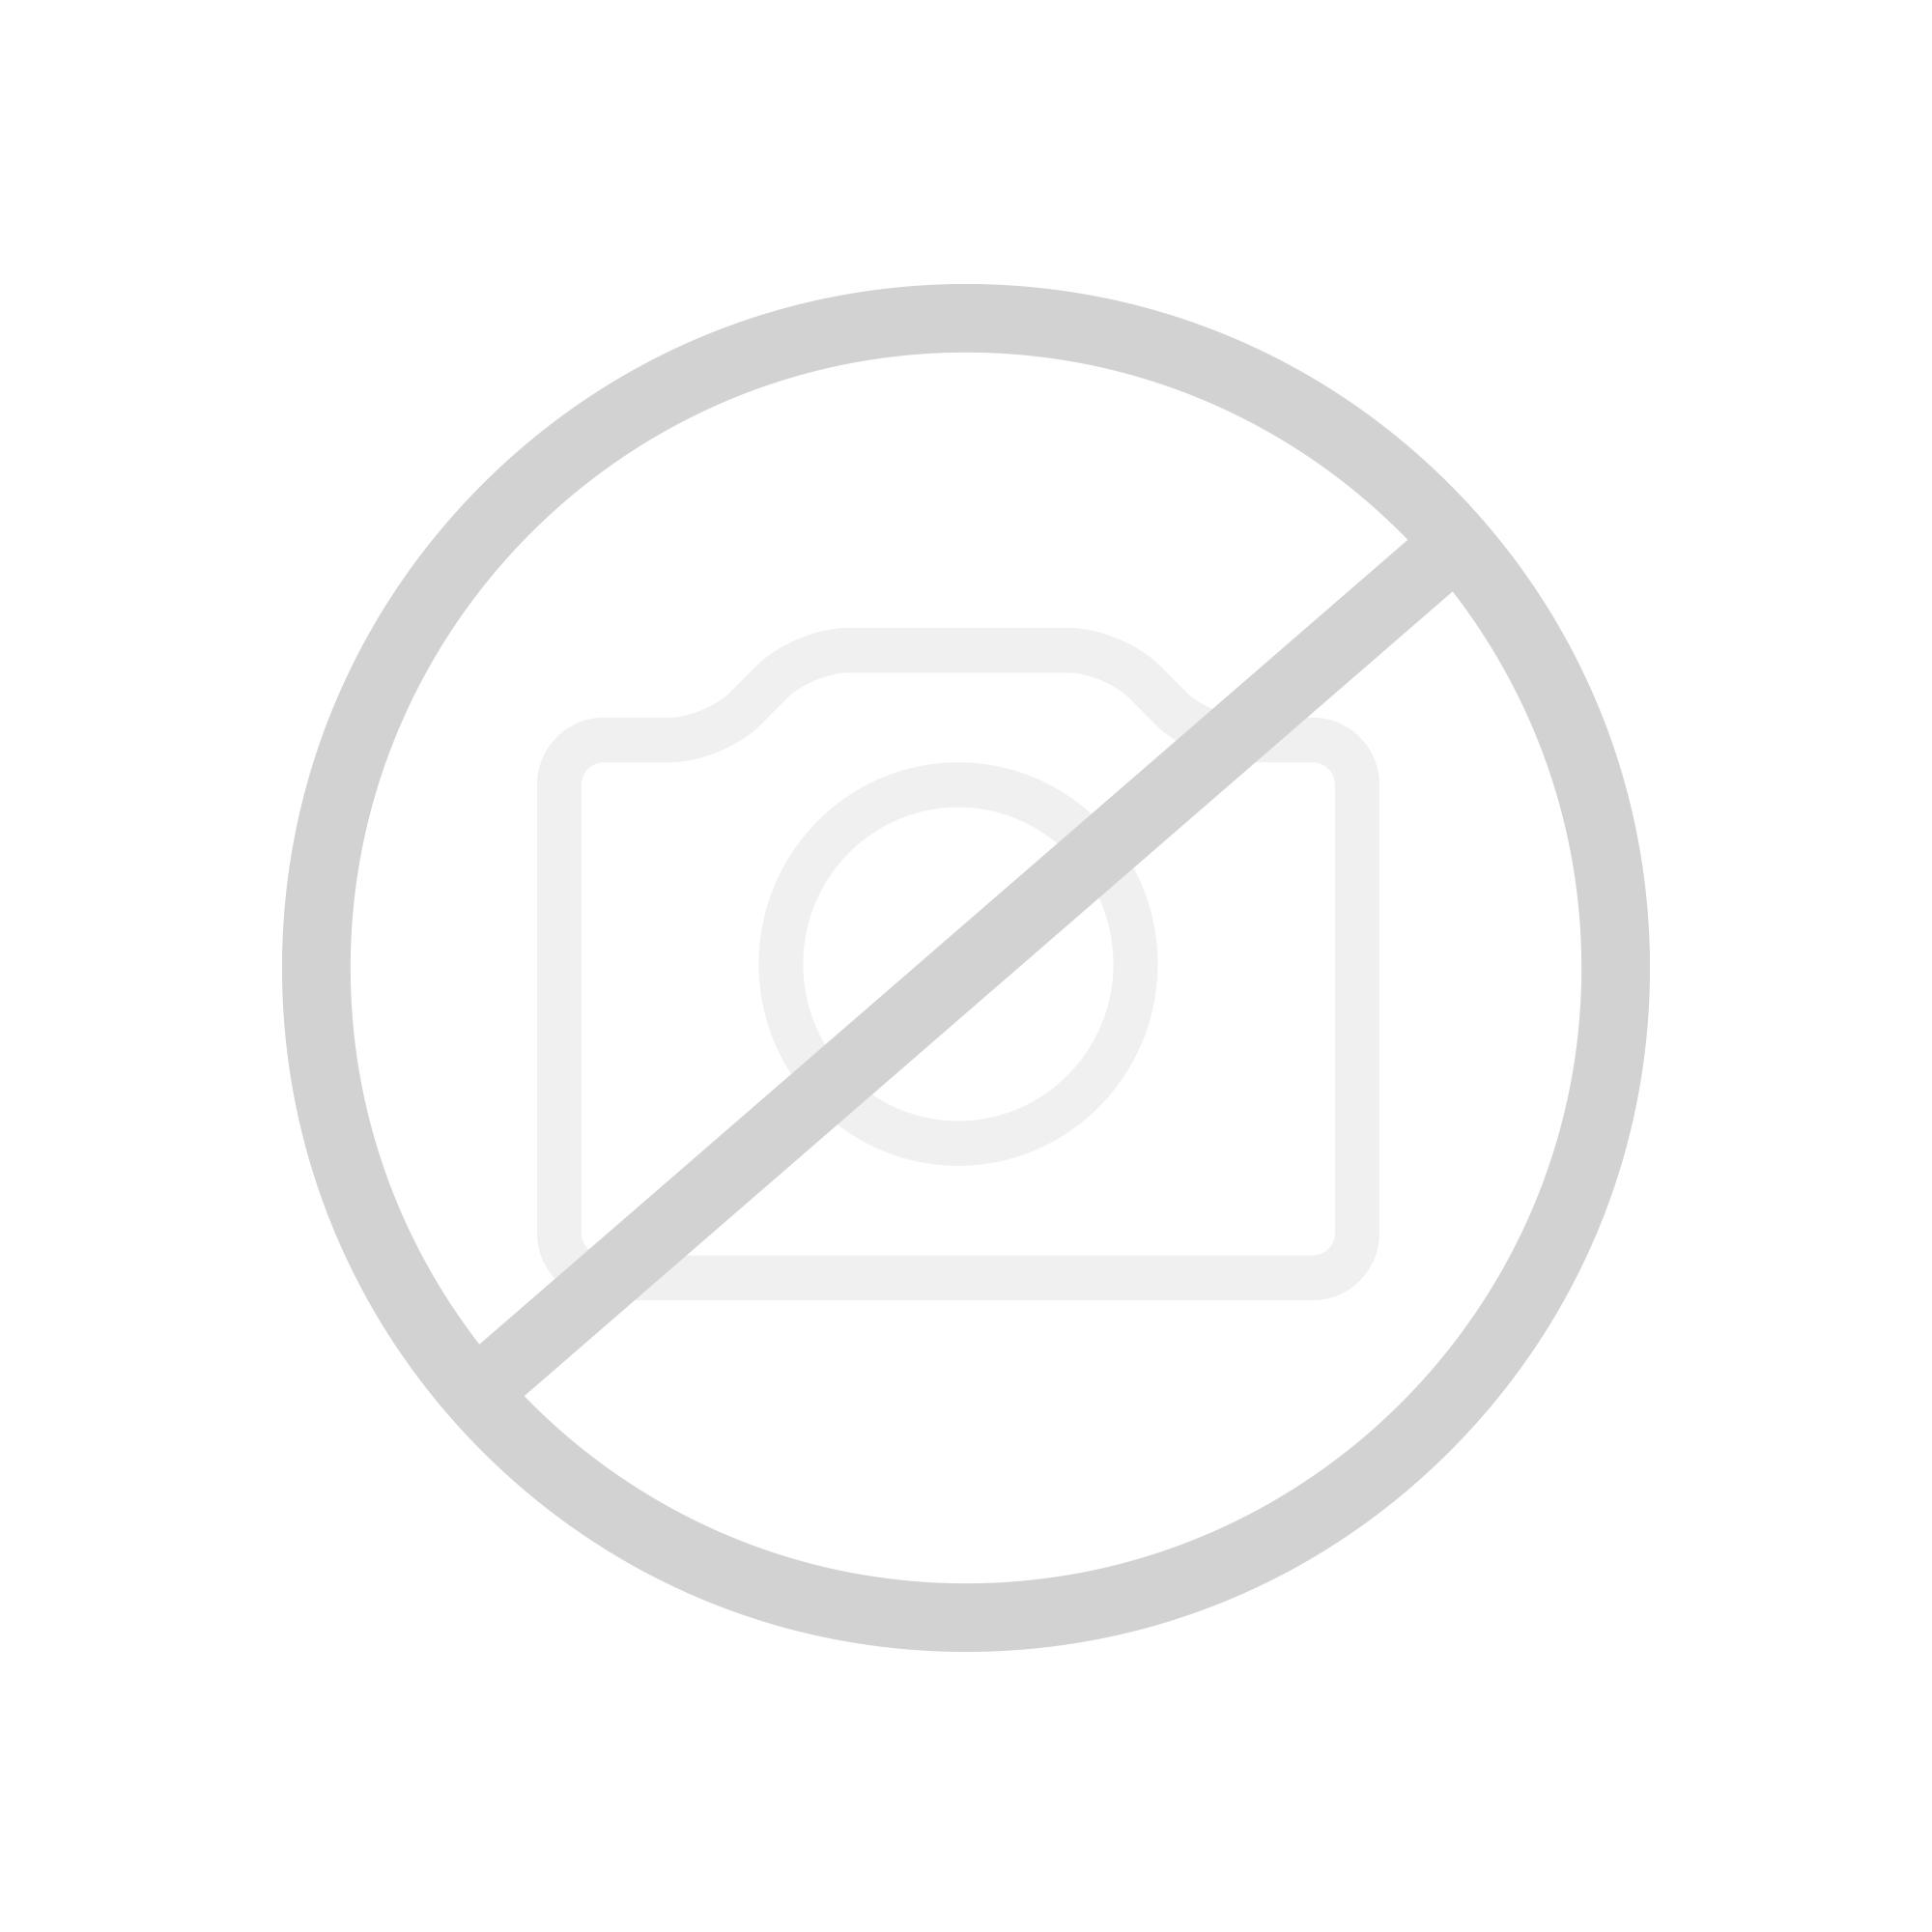 hansgrohe croma 220 air 1jet showerpipe mit einhebelmischer 27222000 reuter onlineshop. Black Bedroom Furniture Sets. Home Design Ideas